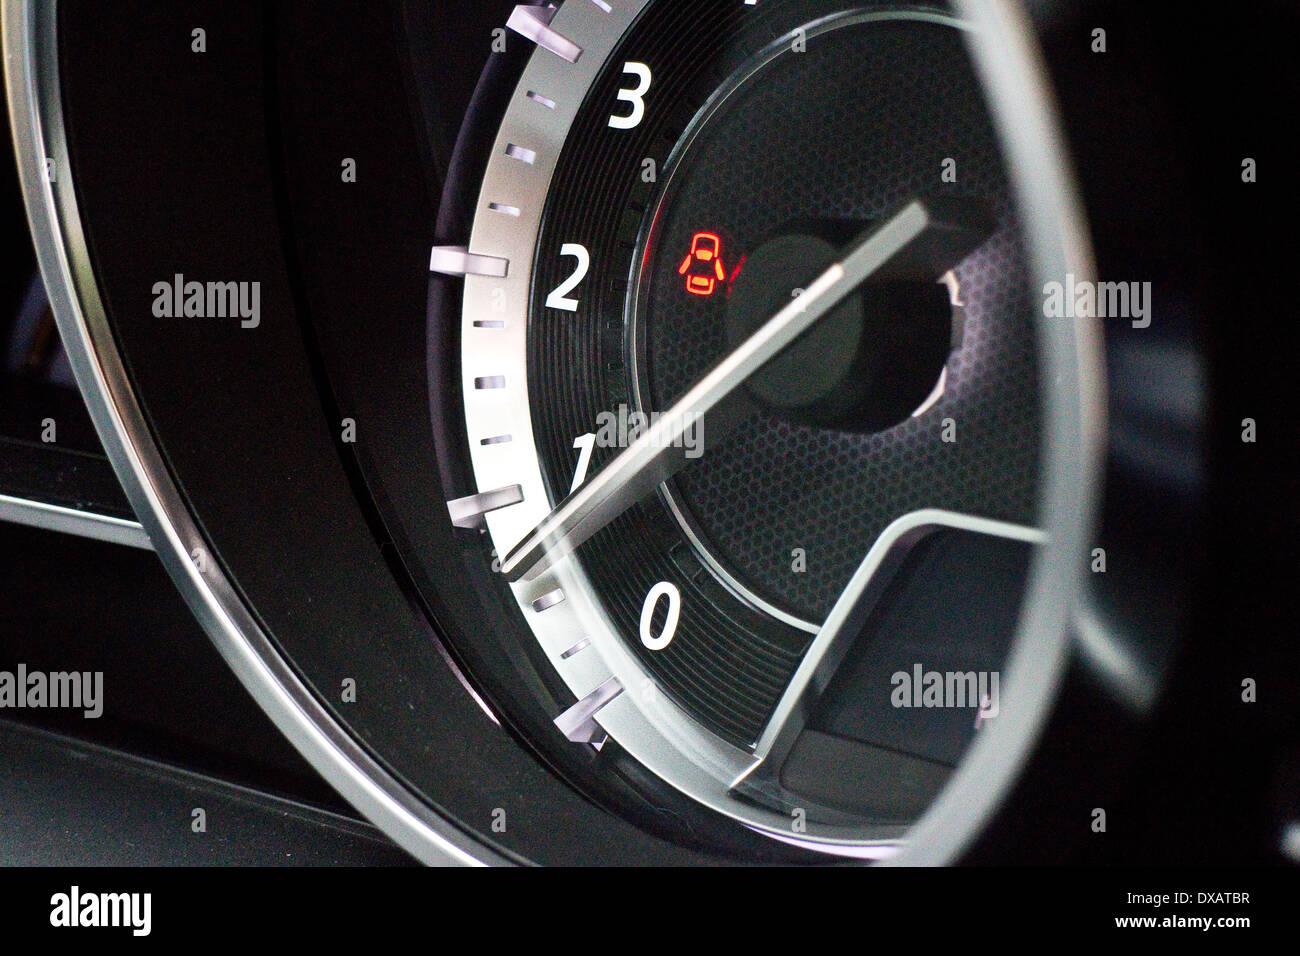 Mazda 6 2014 dashboard - Stock Image